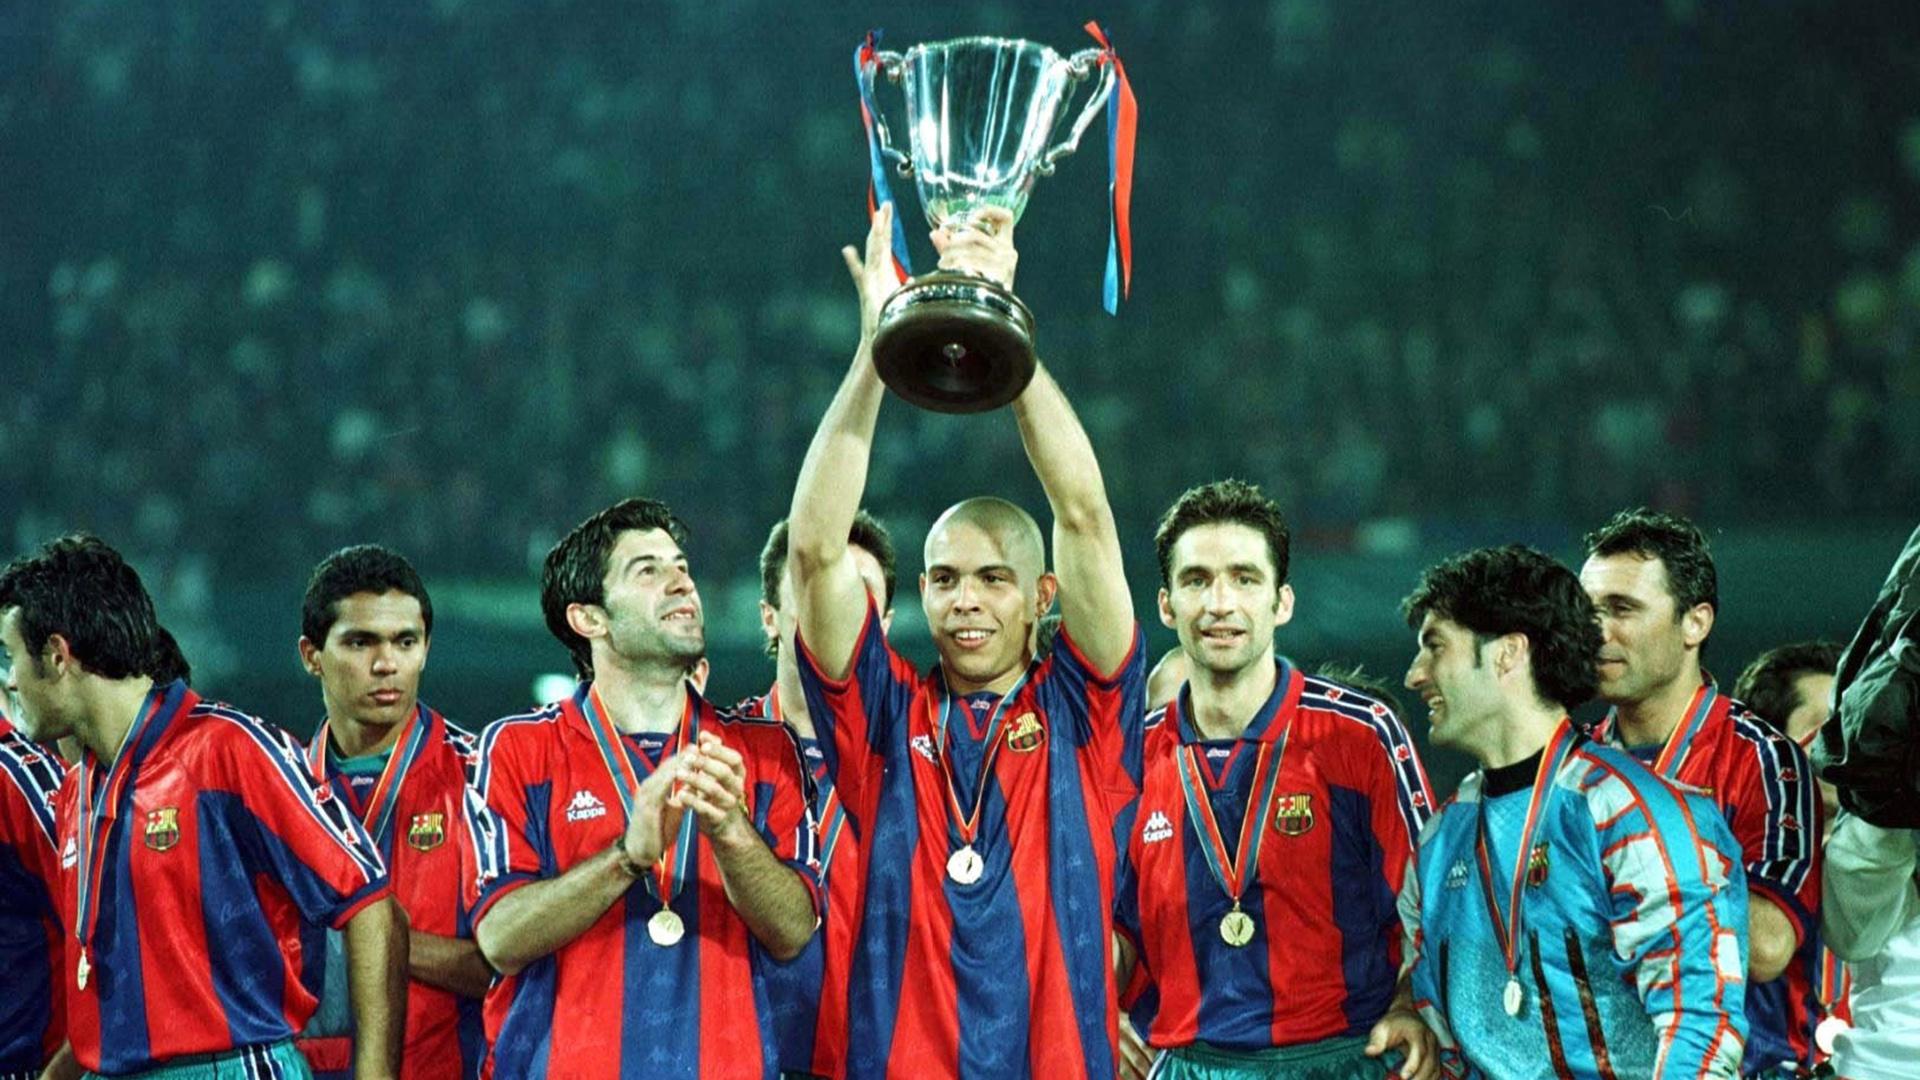 Хет-трик «Валенсии» в 1996-м – самый яркий перфоманс Роналдо в «Барселоне». Соперника не спас даже гол Валерия Карпина